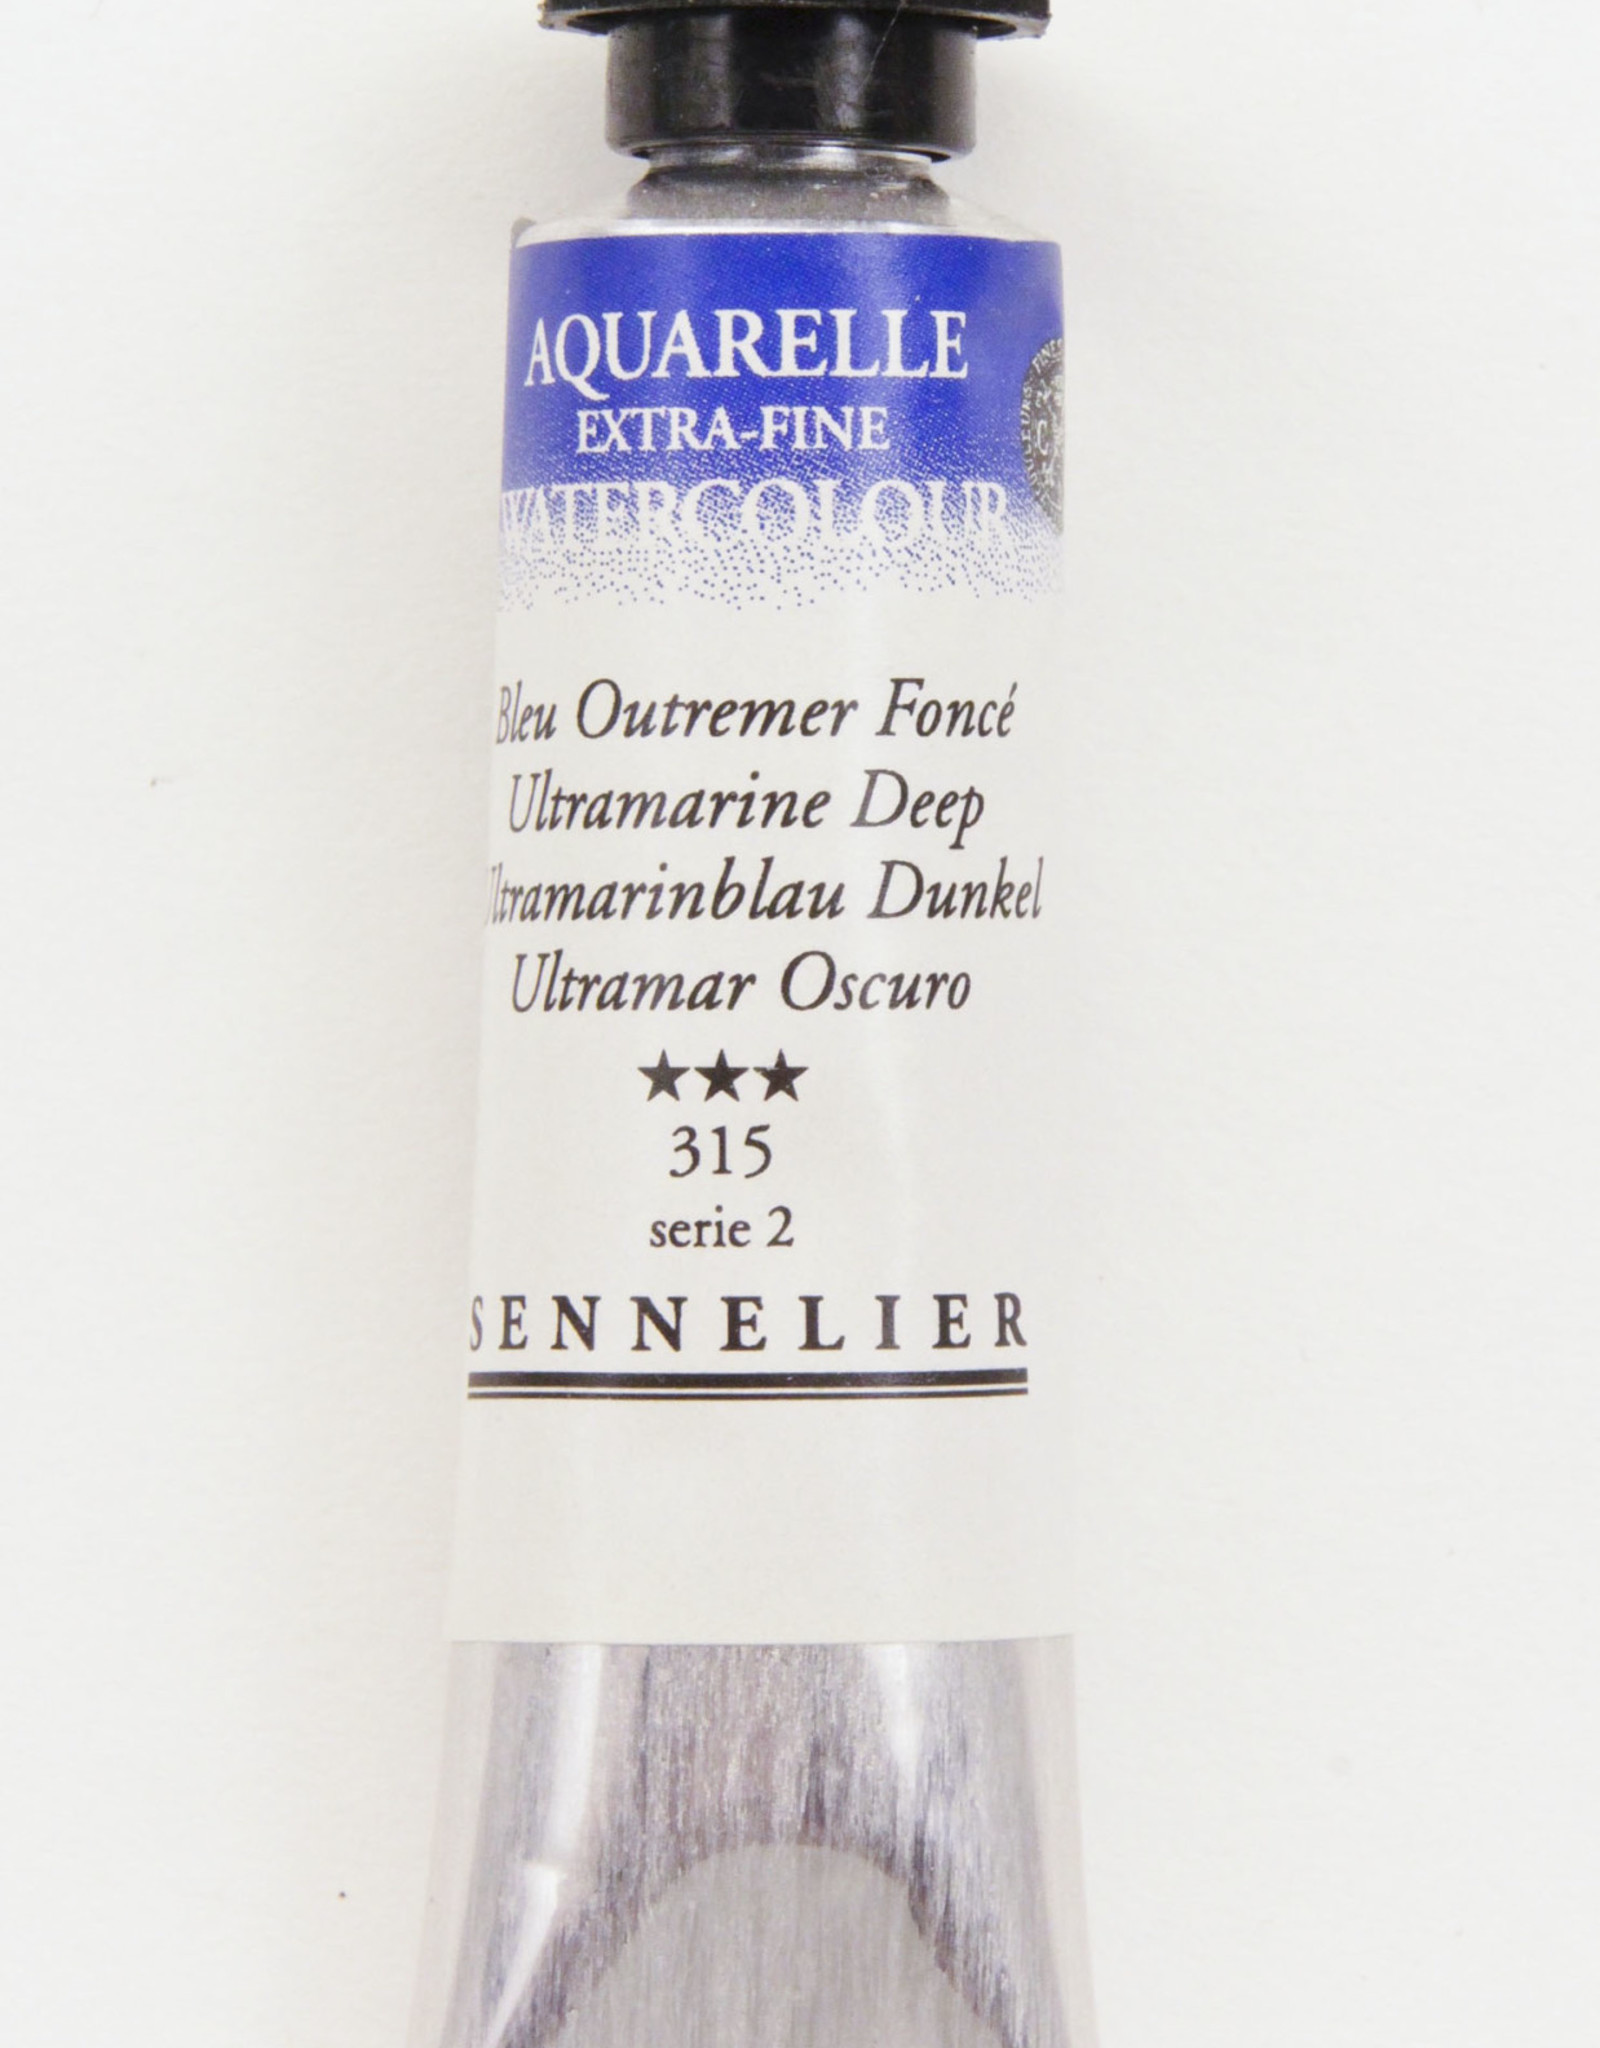 Sennelier, Aquarelle Watercolor Paint, Ultramarine Deep, 315,10ml Tube, Series 2